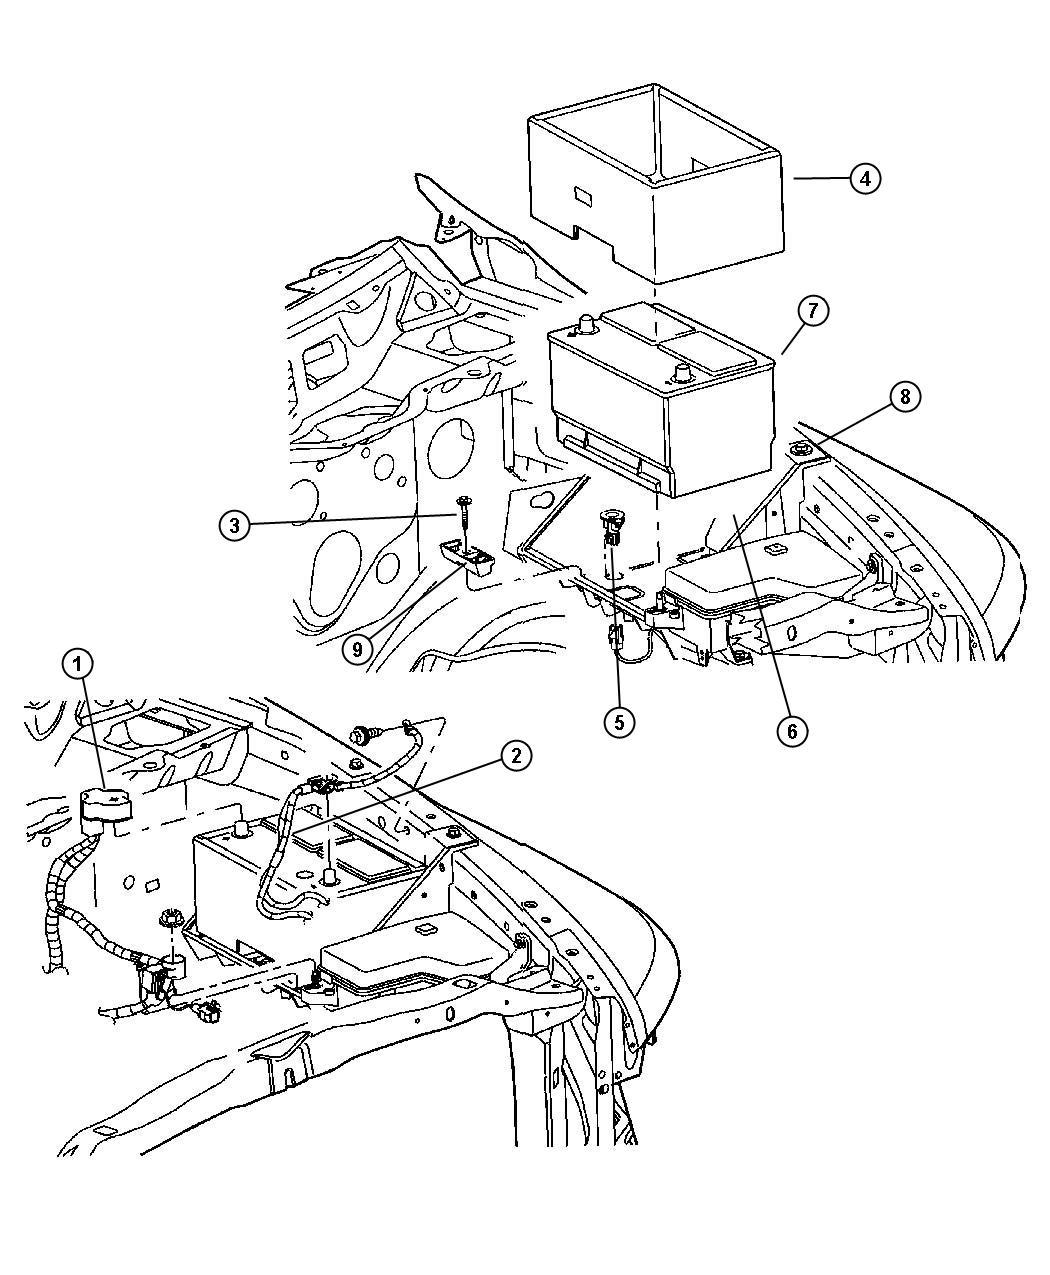 2008 Chrysler Pacifica Wiring Diagram